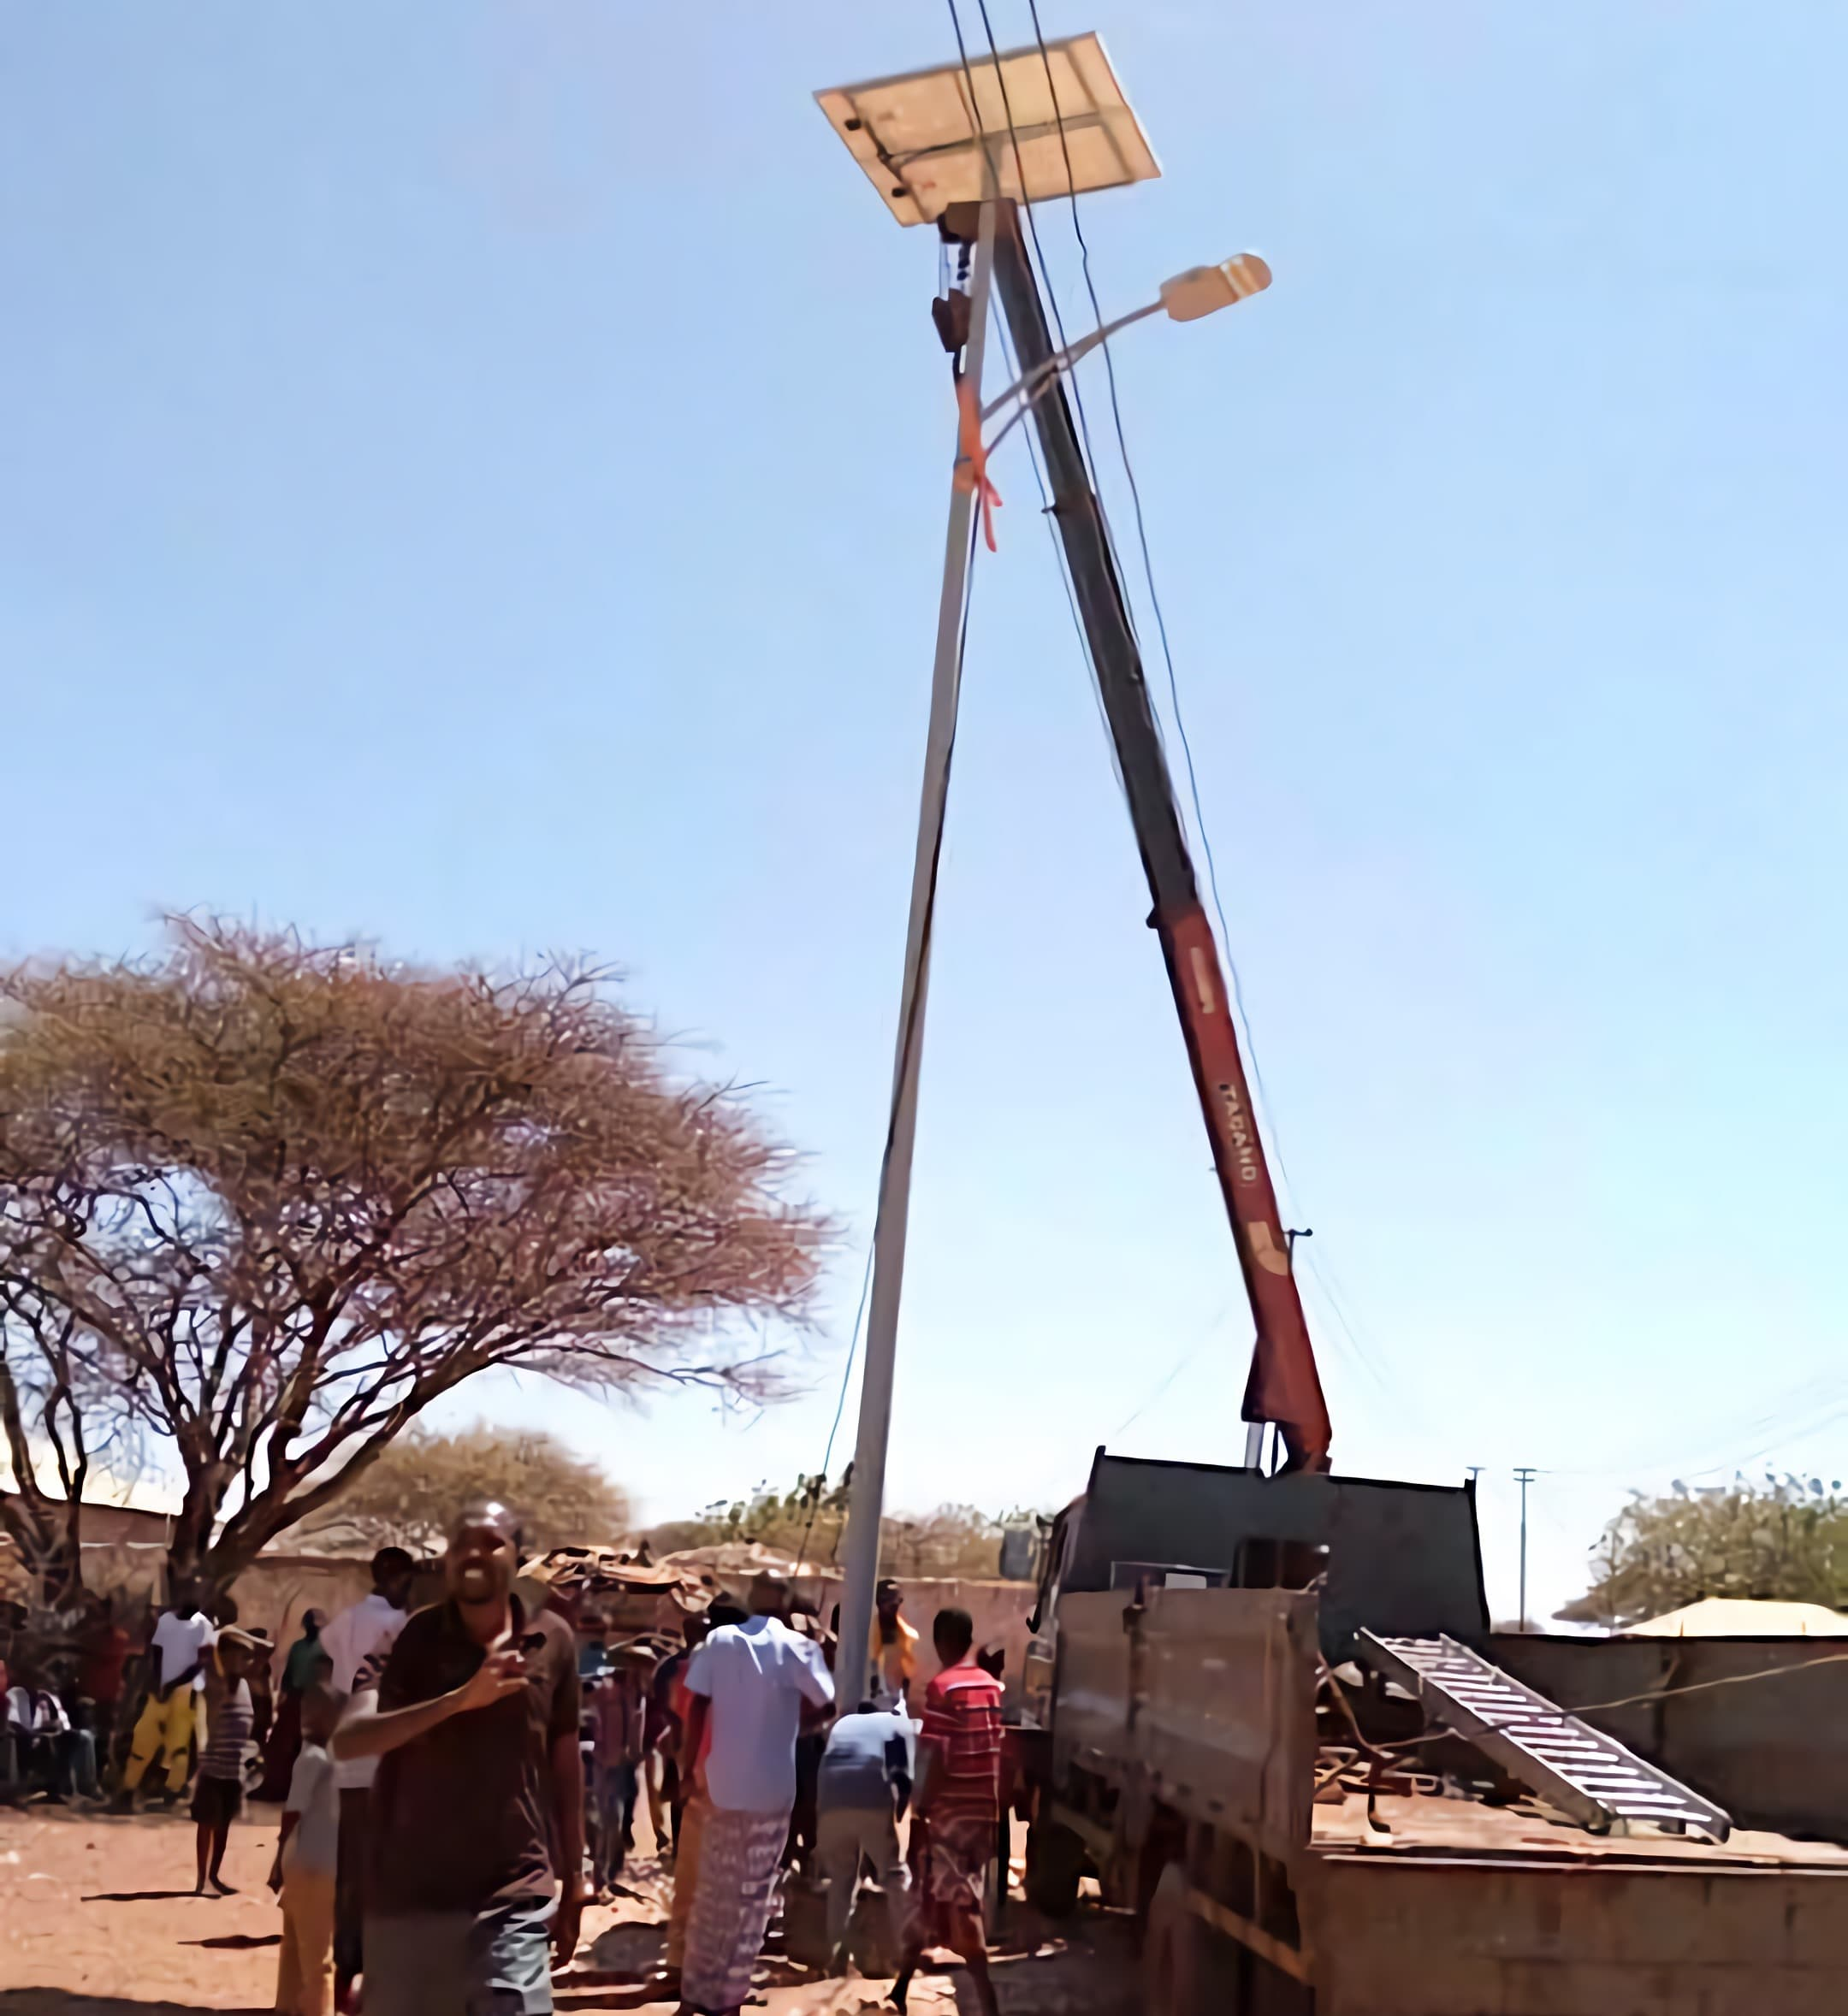 solar-powered-street-light-60-watts-installation-in-Mogadishu-of-Somalia